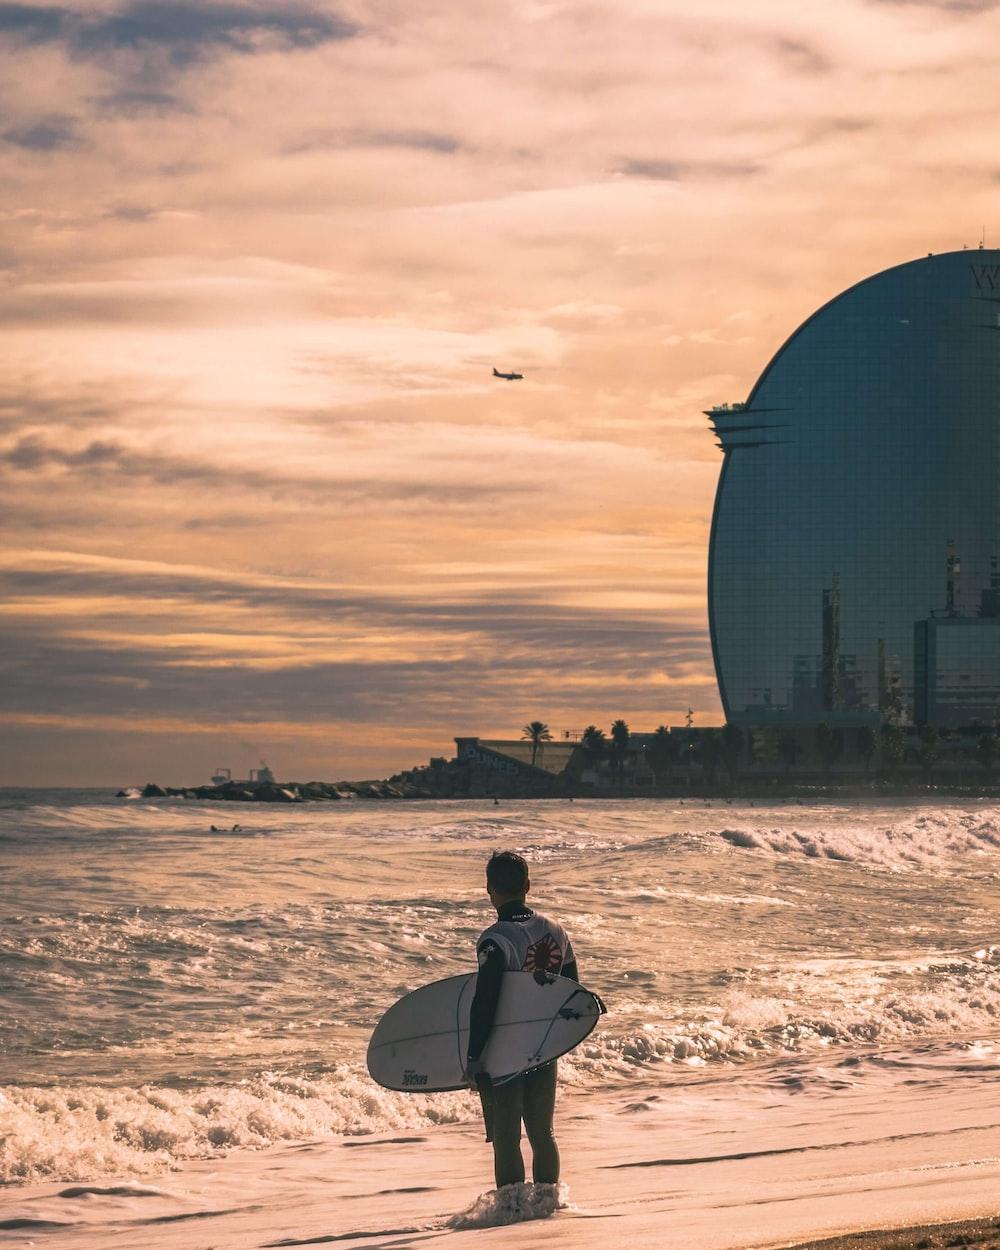 man standing on the seashore holding surfboard